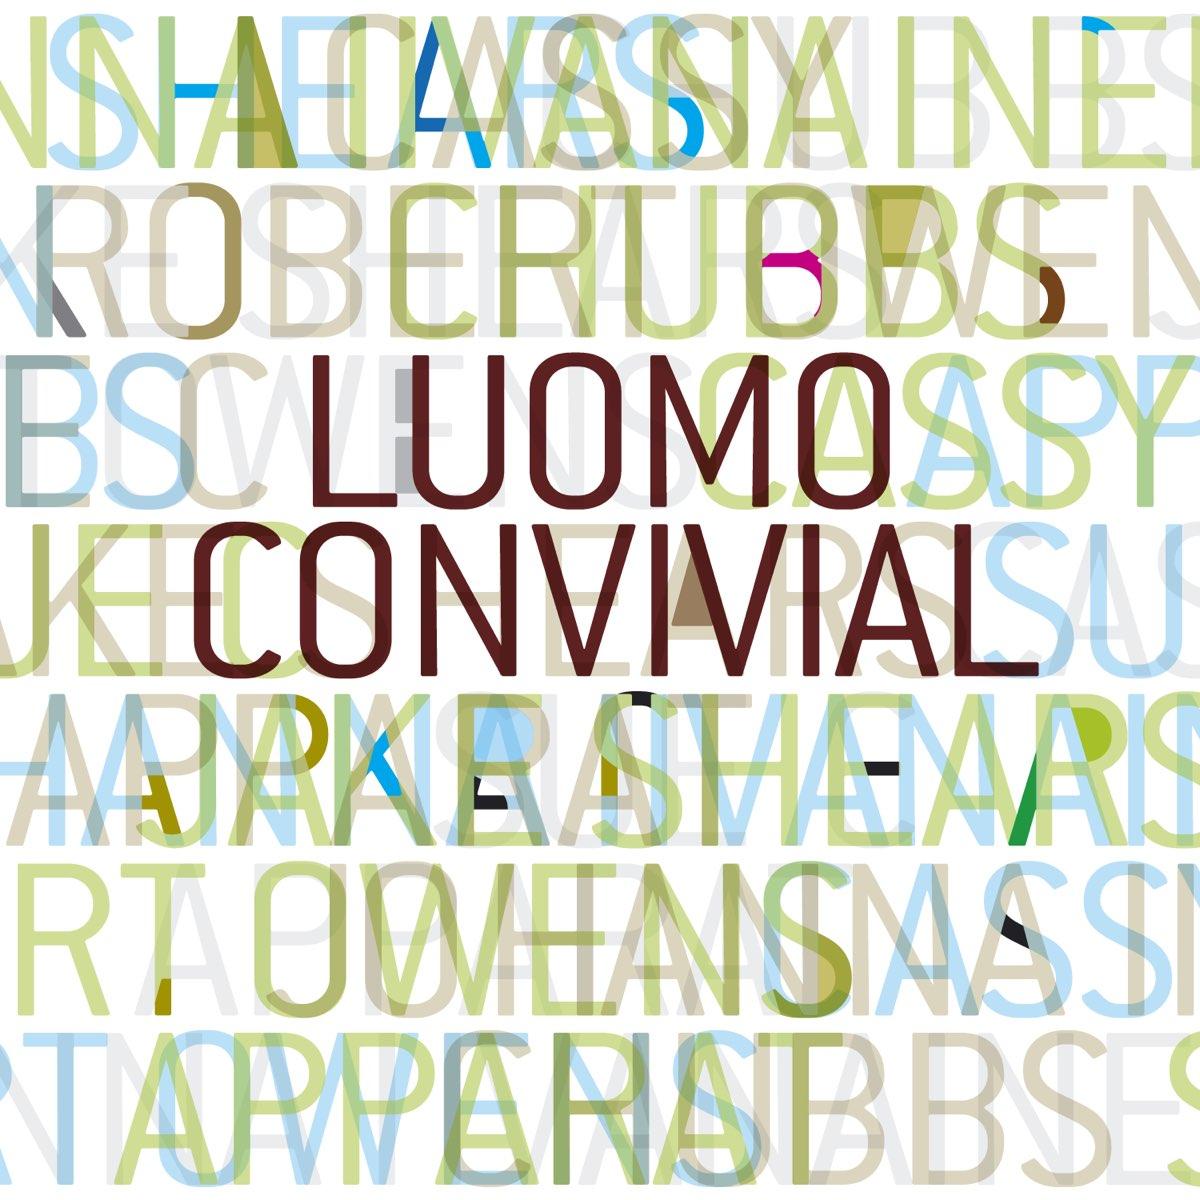 Luomo, Convivial